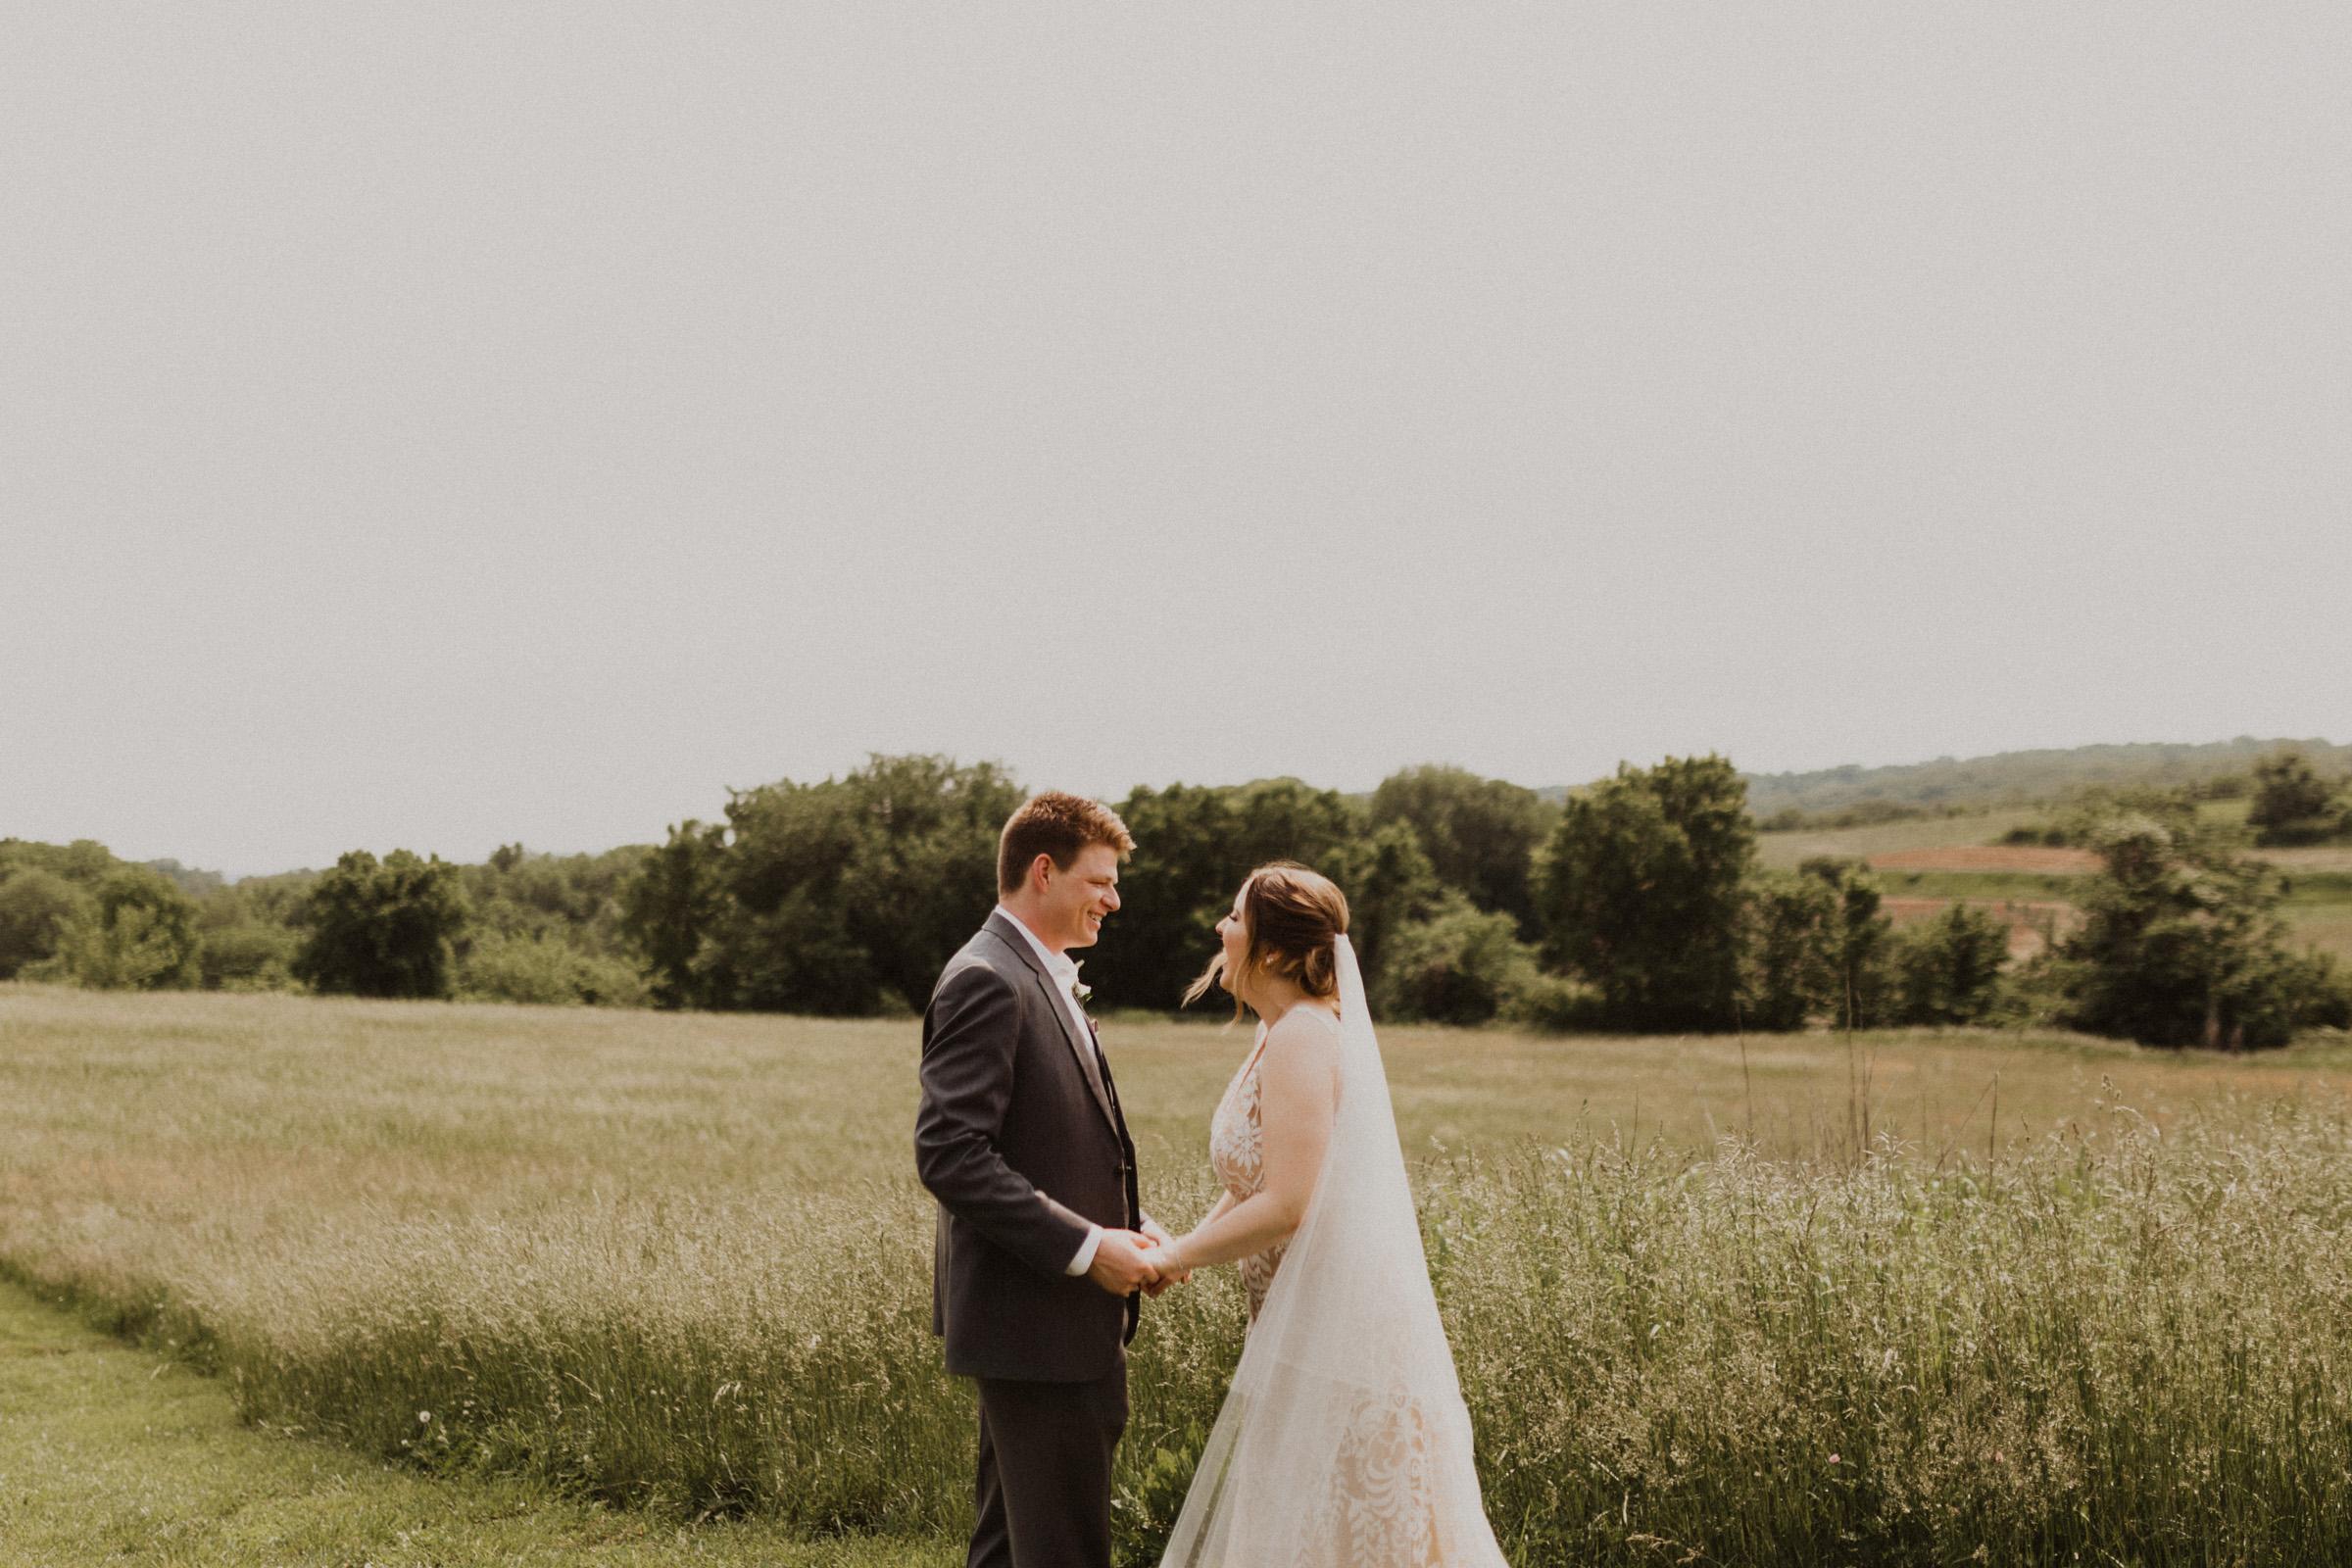 alyssa barletter photography weston red barn farm timberbarn summer outdoor wedding-33.jpg